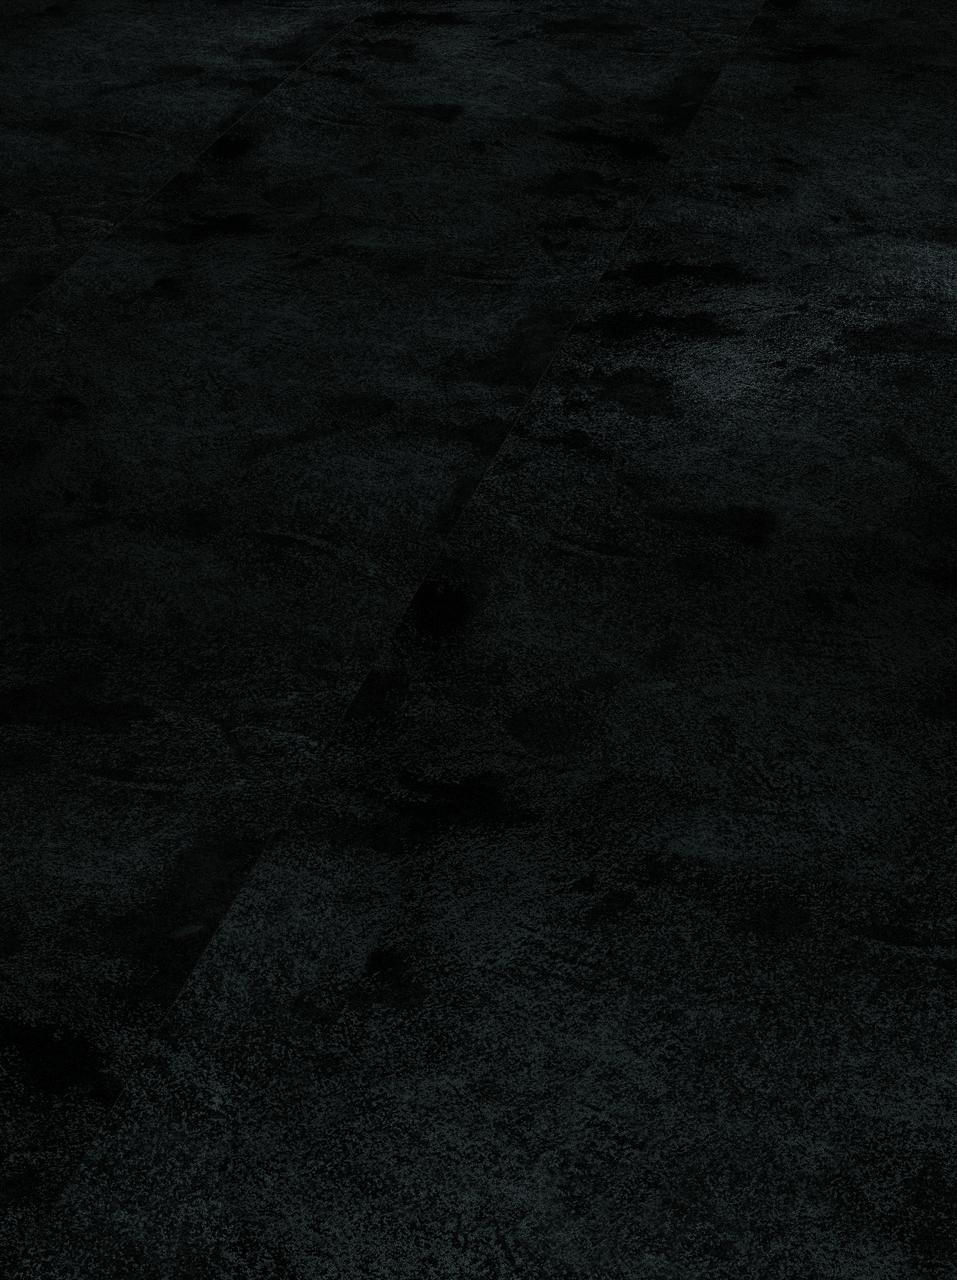 Ламинат Parador 1601144 TrendTime4 V4 Мрамор черный